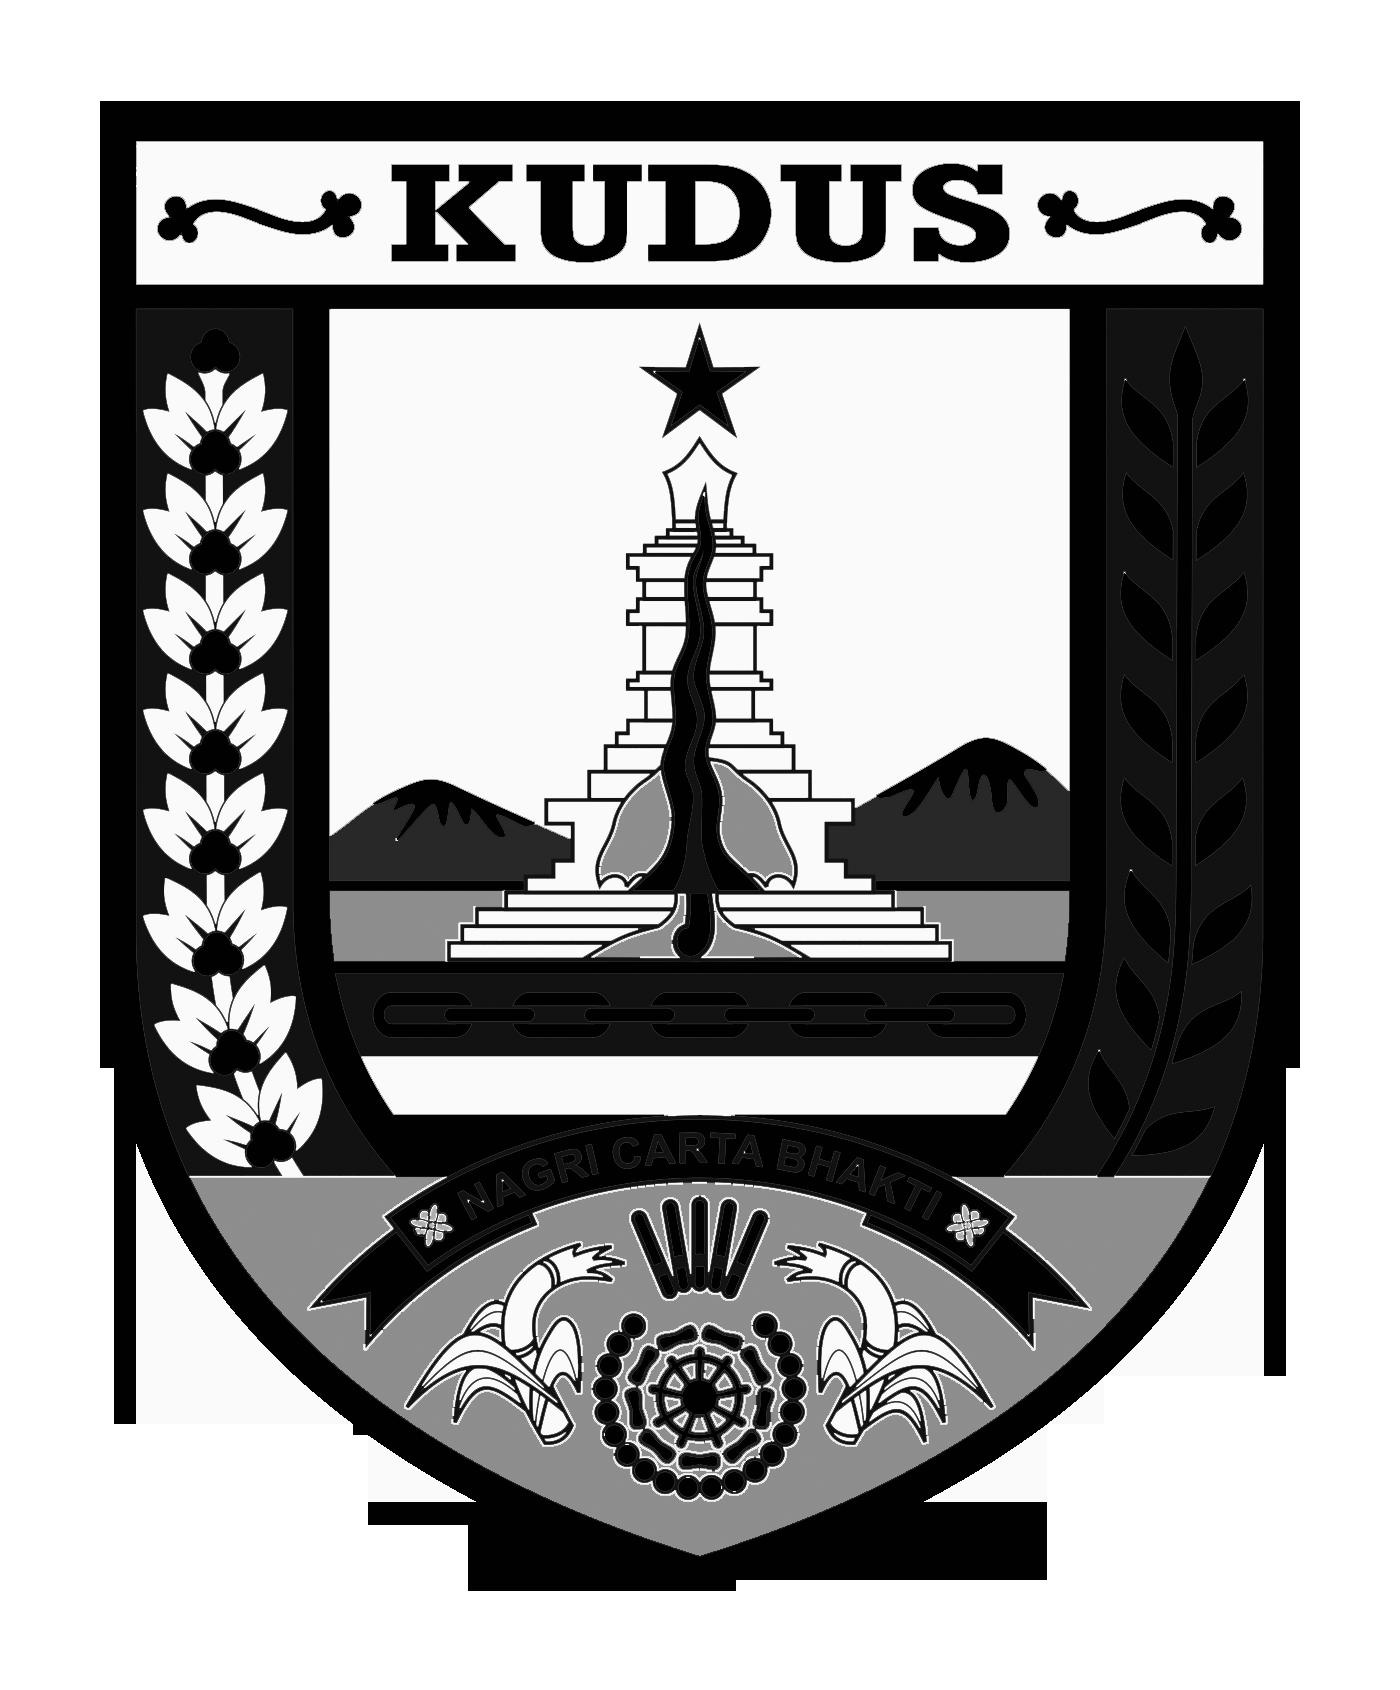 Logo Kudus (INDONESIA)Hitam Putih